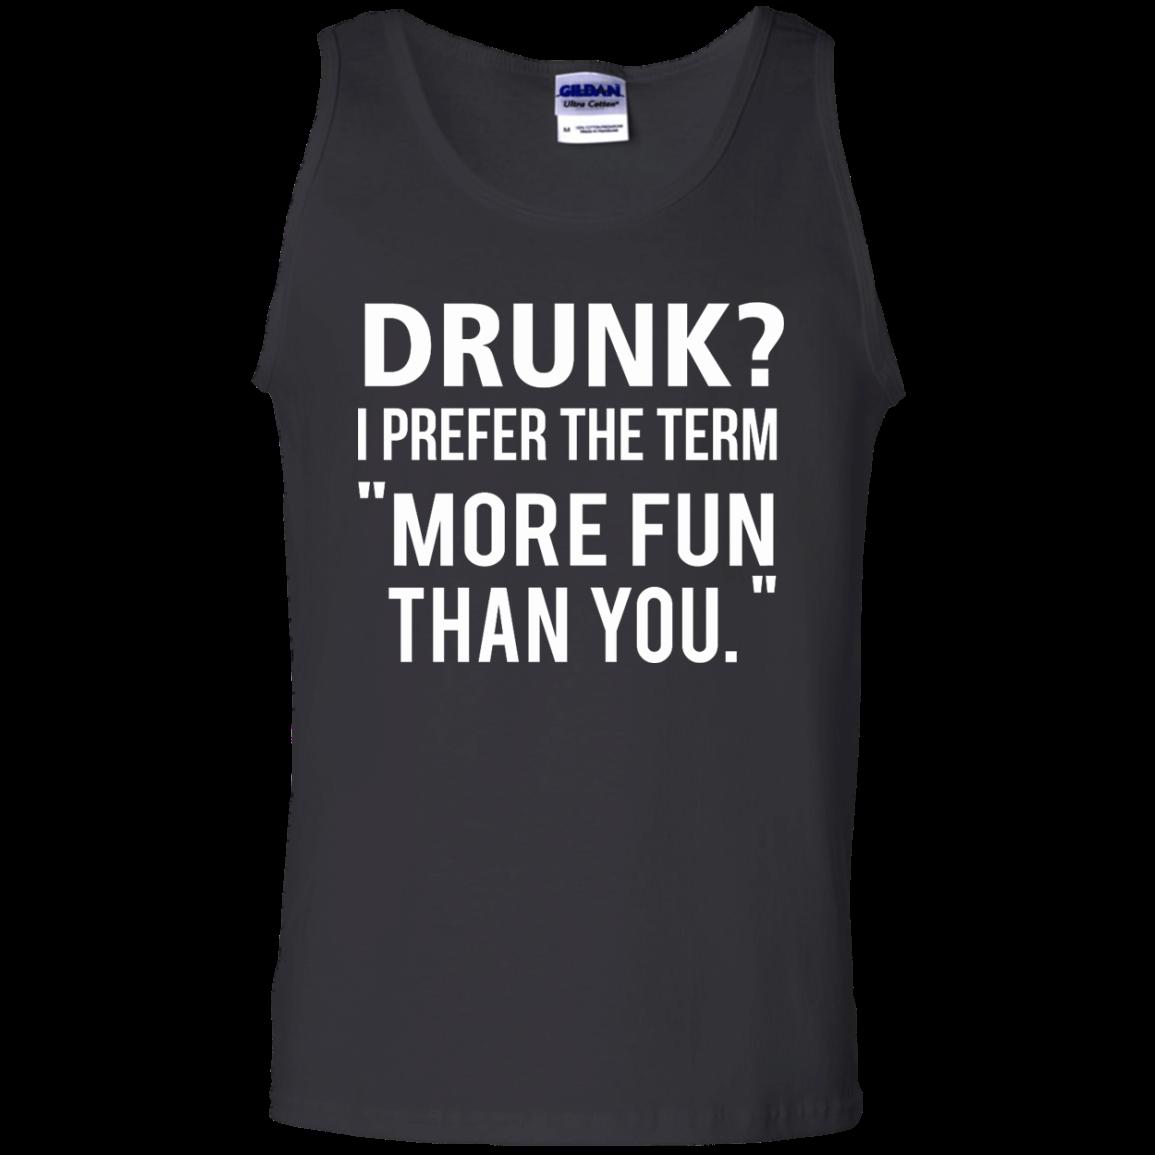 Love beer Shirt Drunk,I prefer the term more fun than you T shirt,Tank top & Hoodies